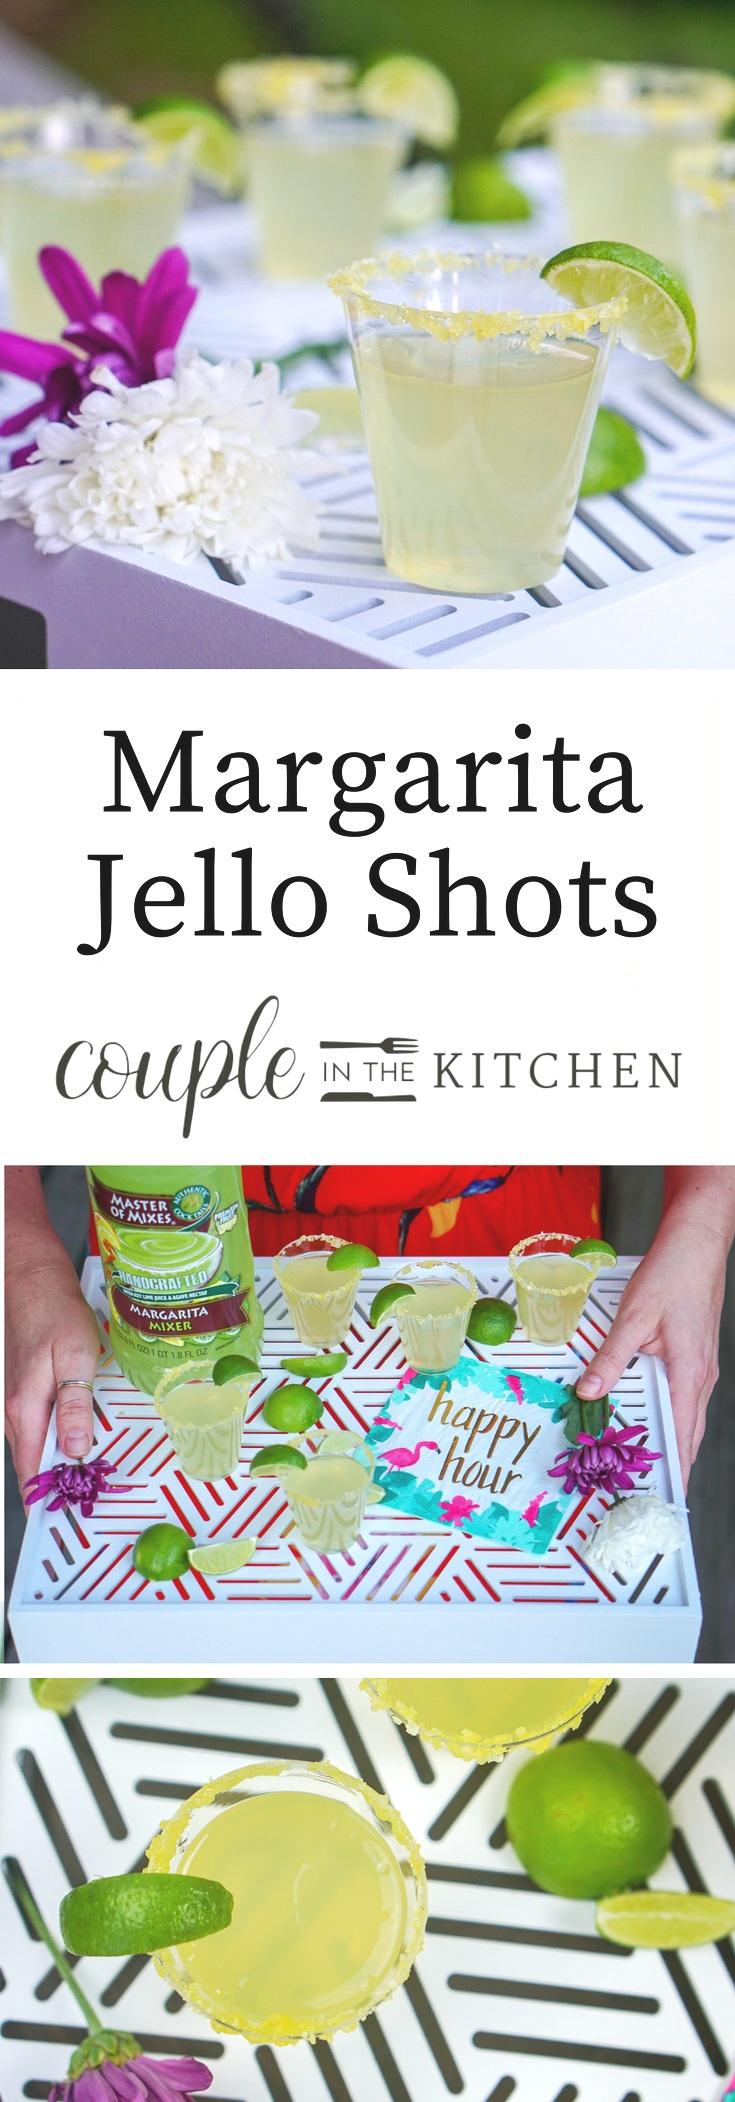 Margarita Jello Shots | coupleinthekitchen.com